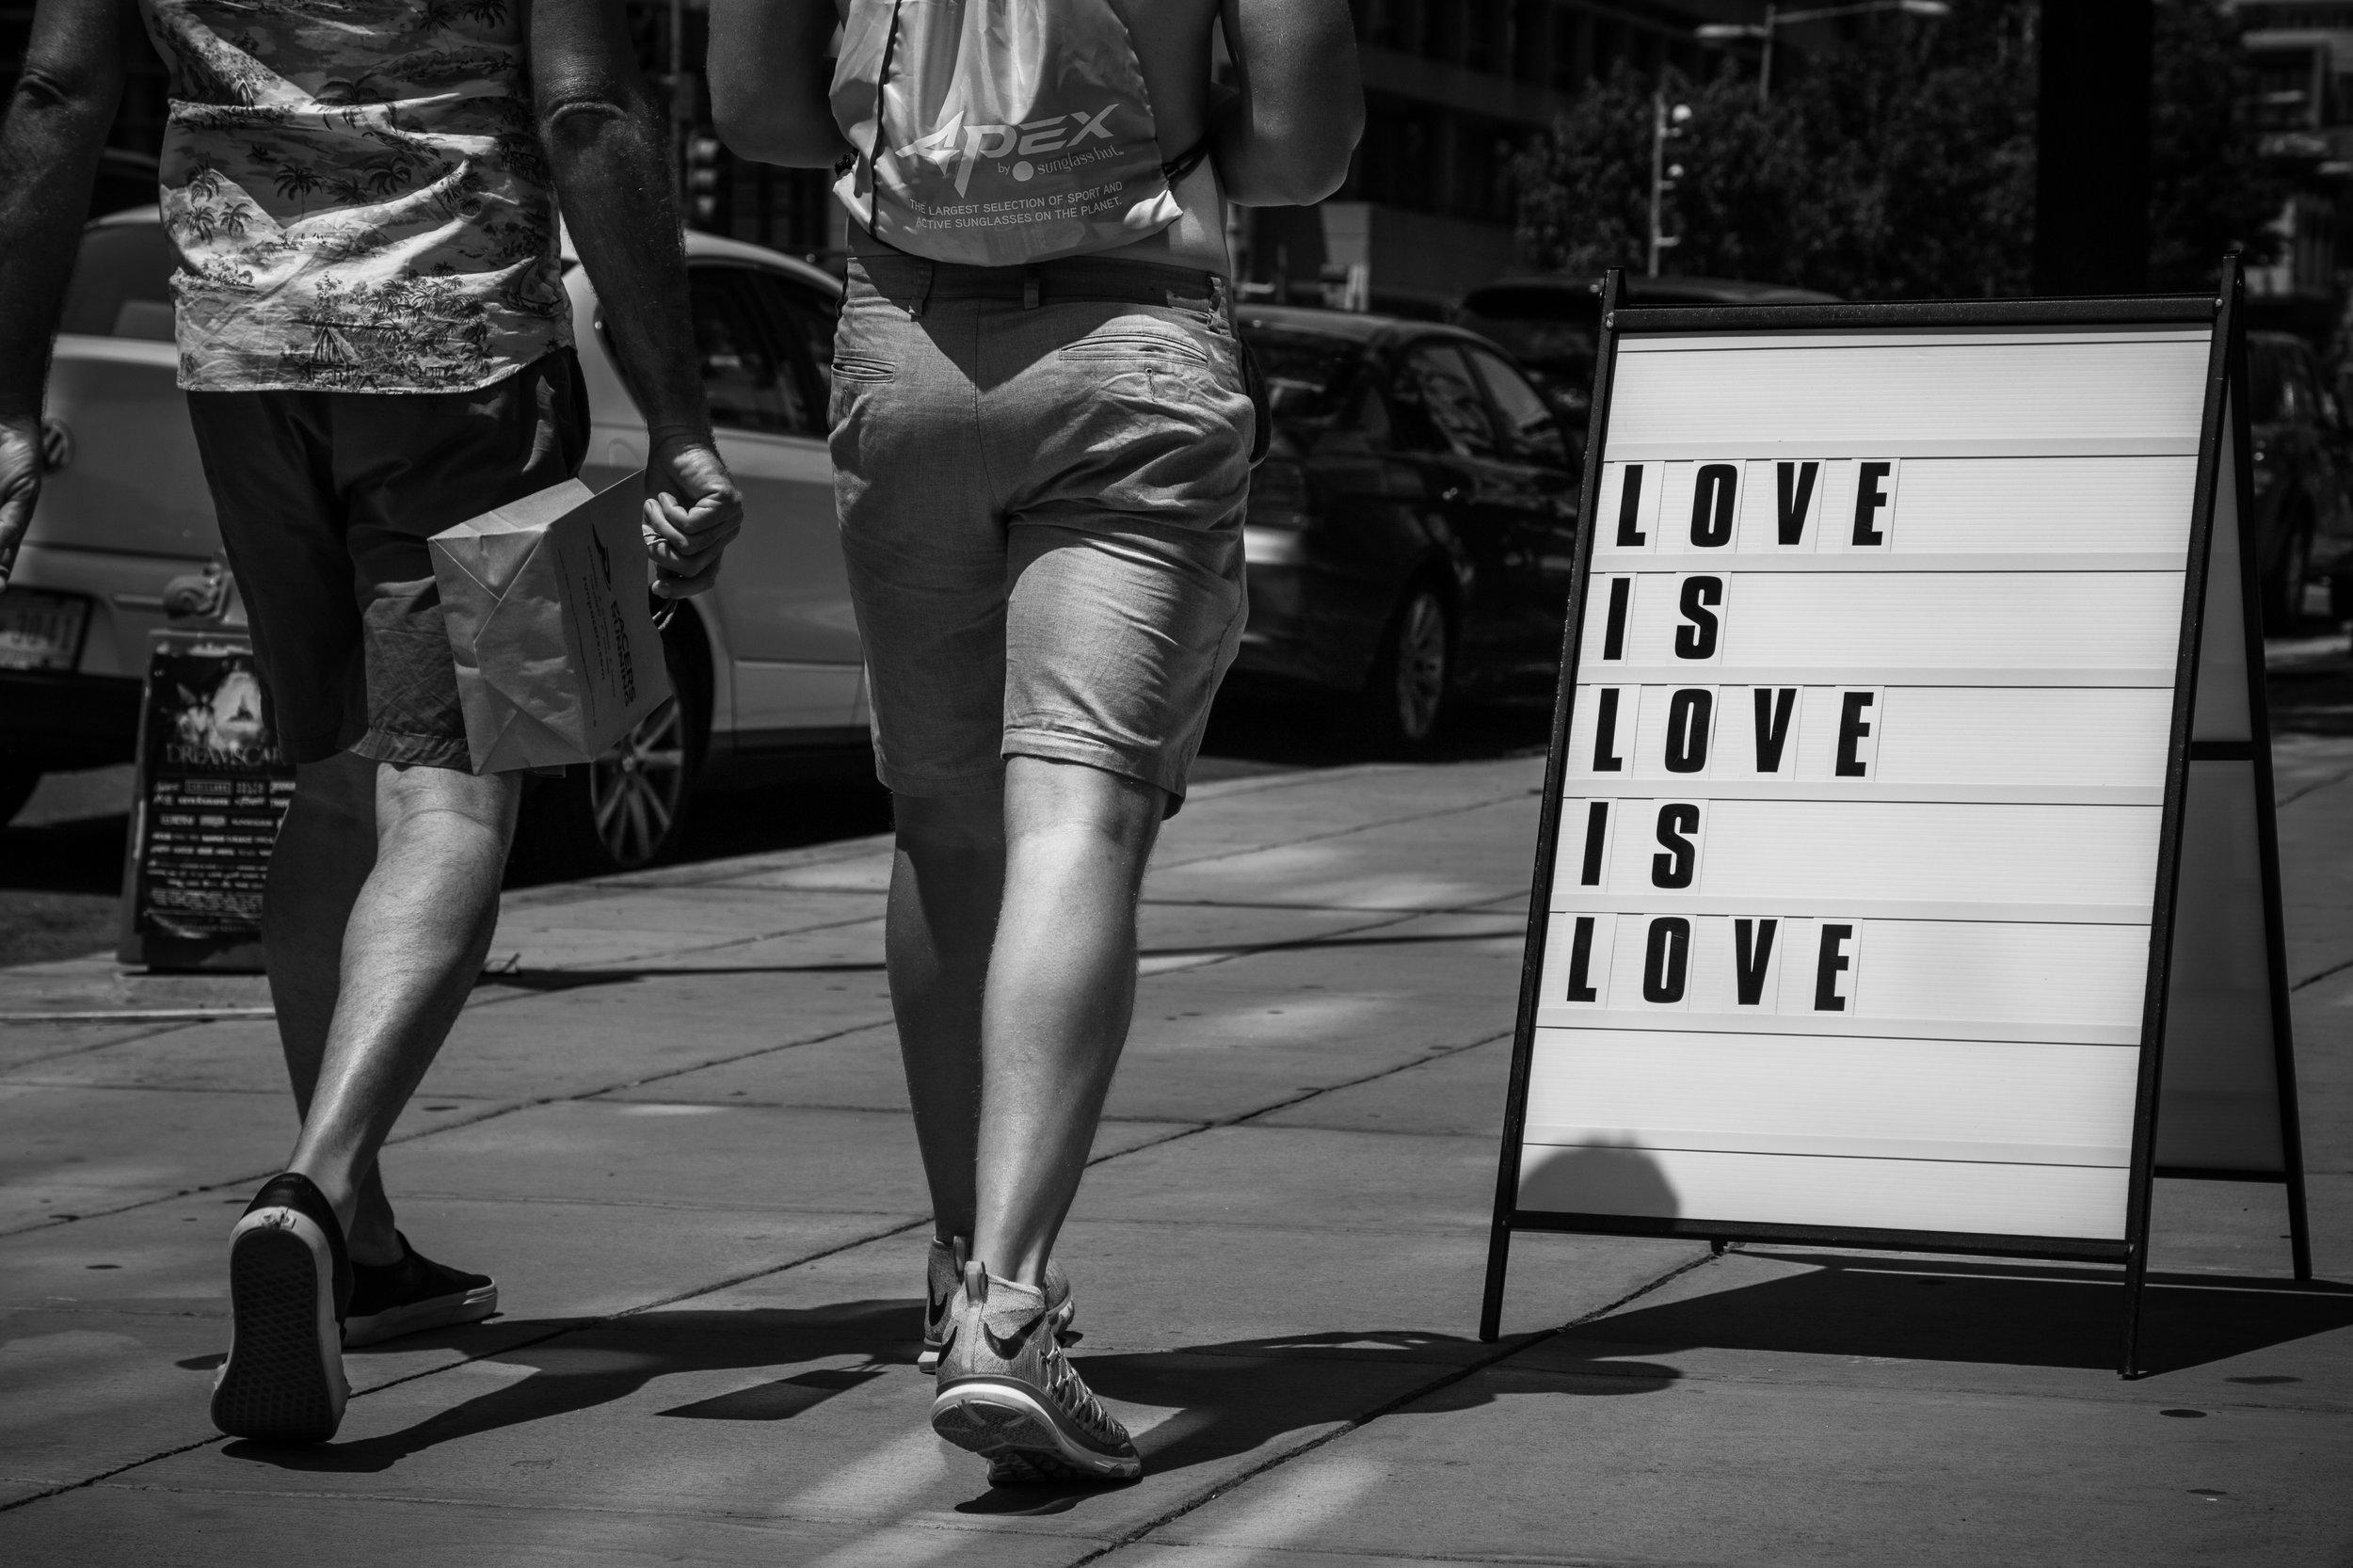 Love Is Love Is Love. Washington, D.C. (June 2017)